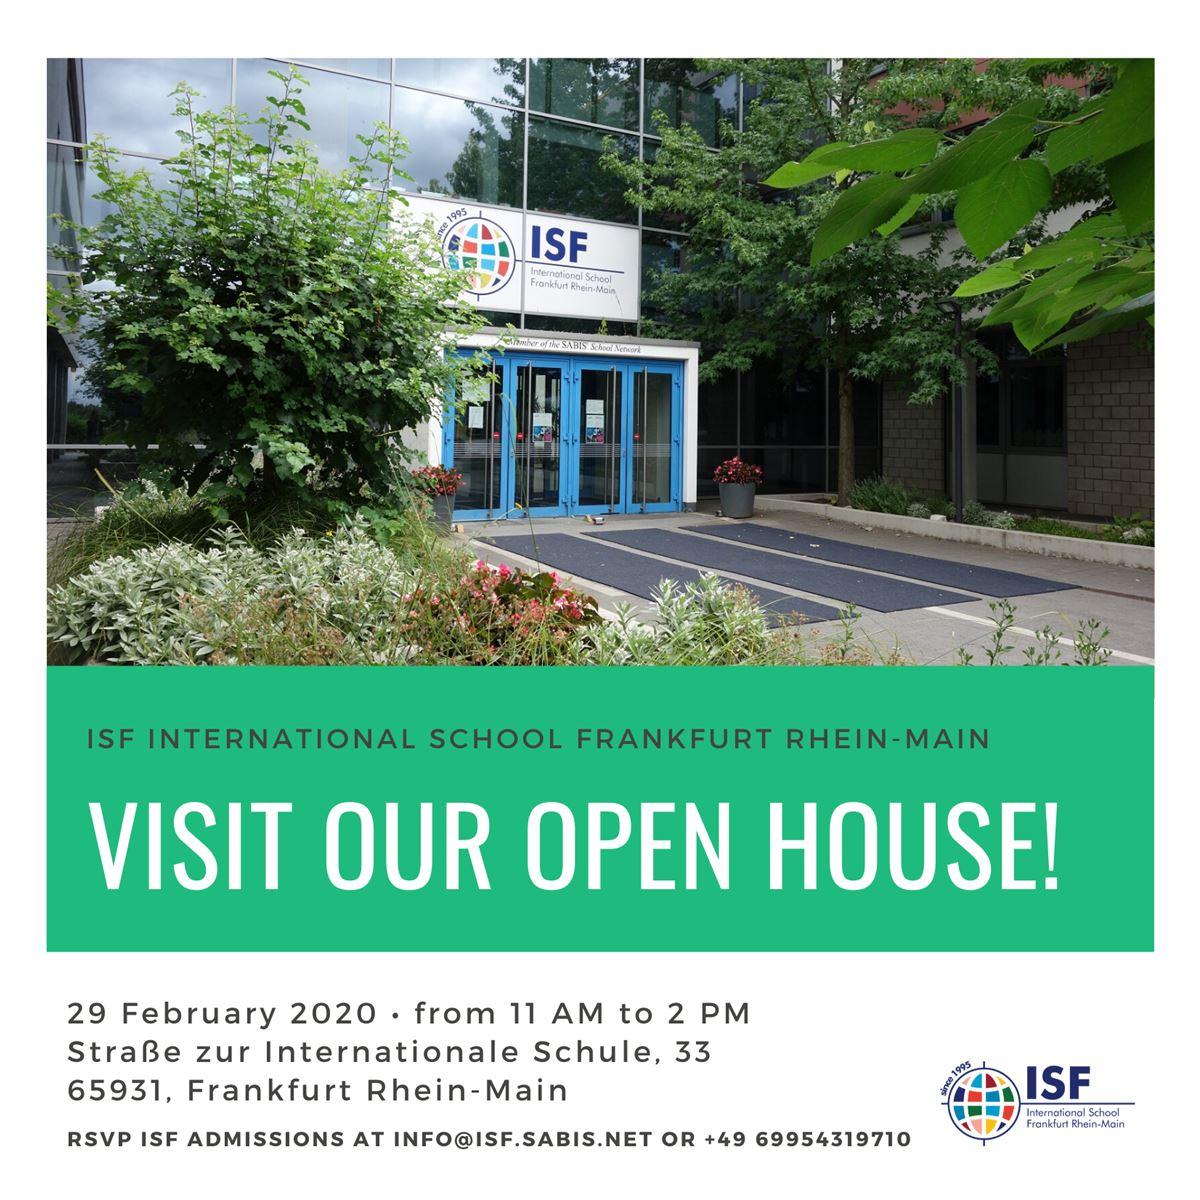 ISF International School Frankfurt Rhein Main